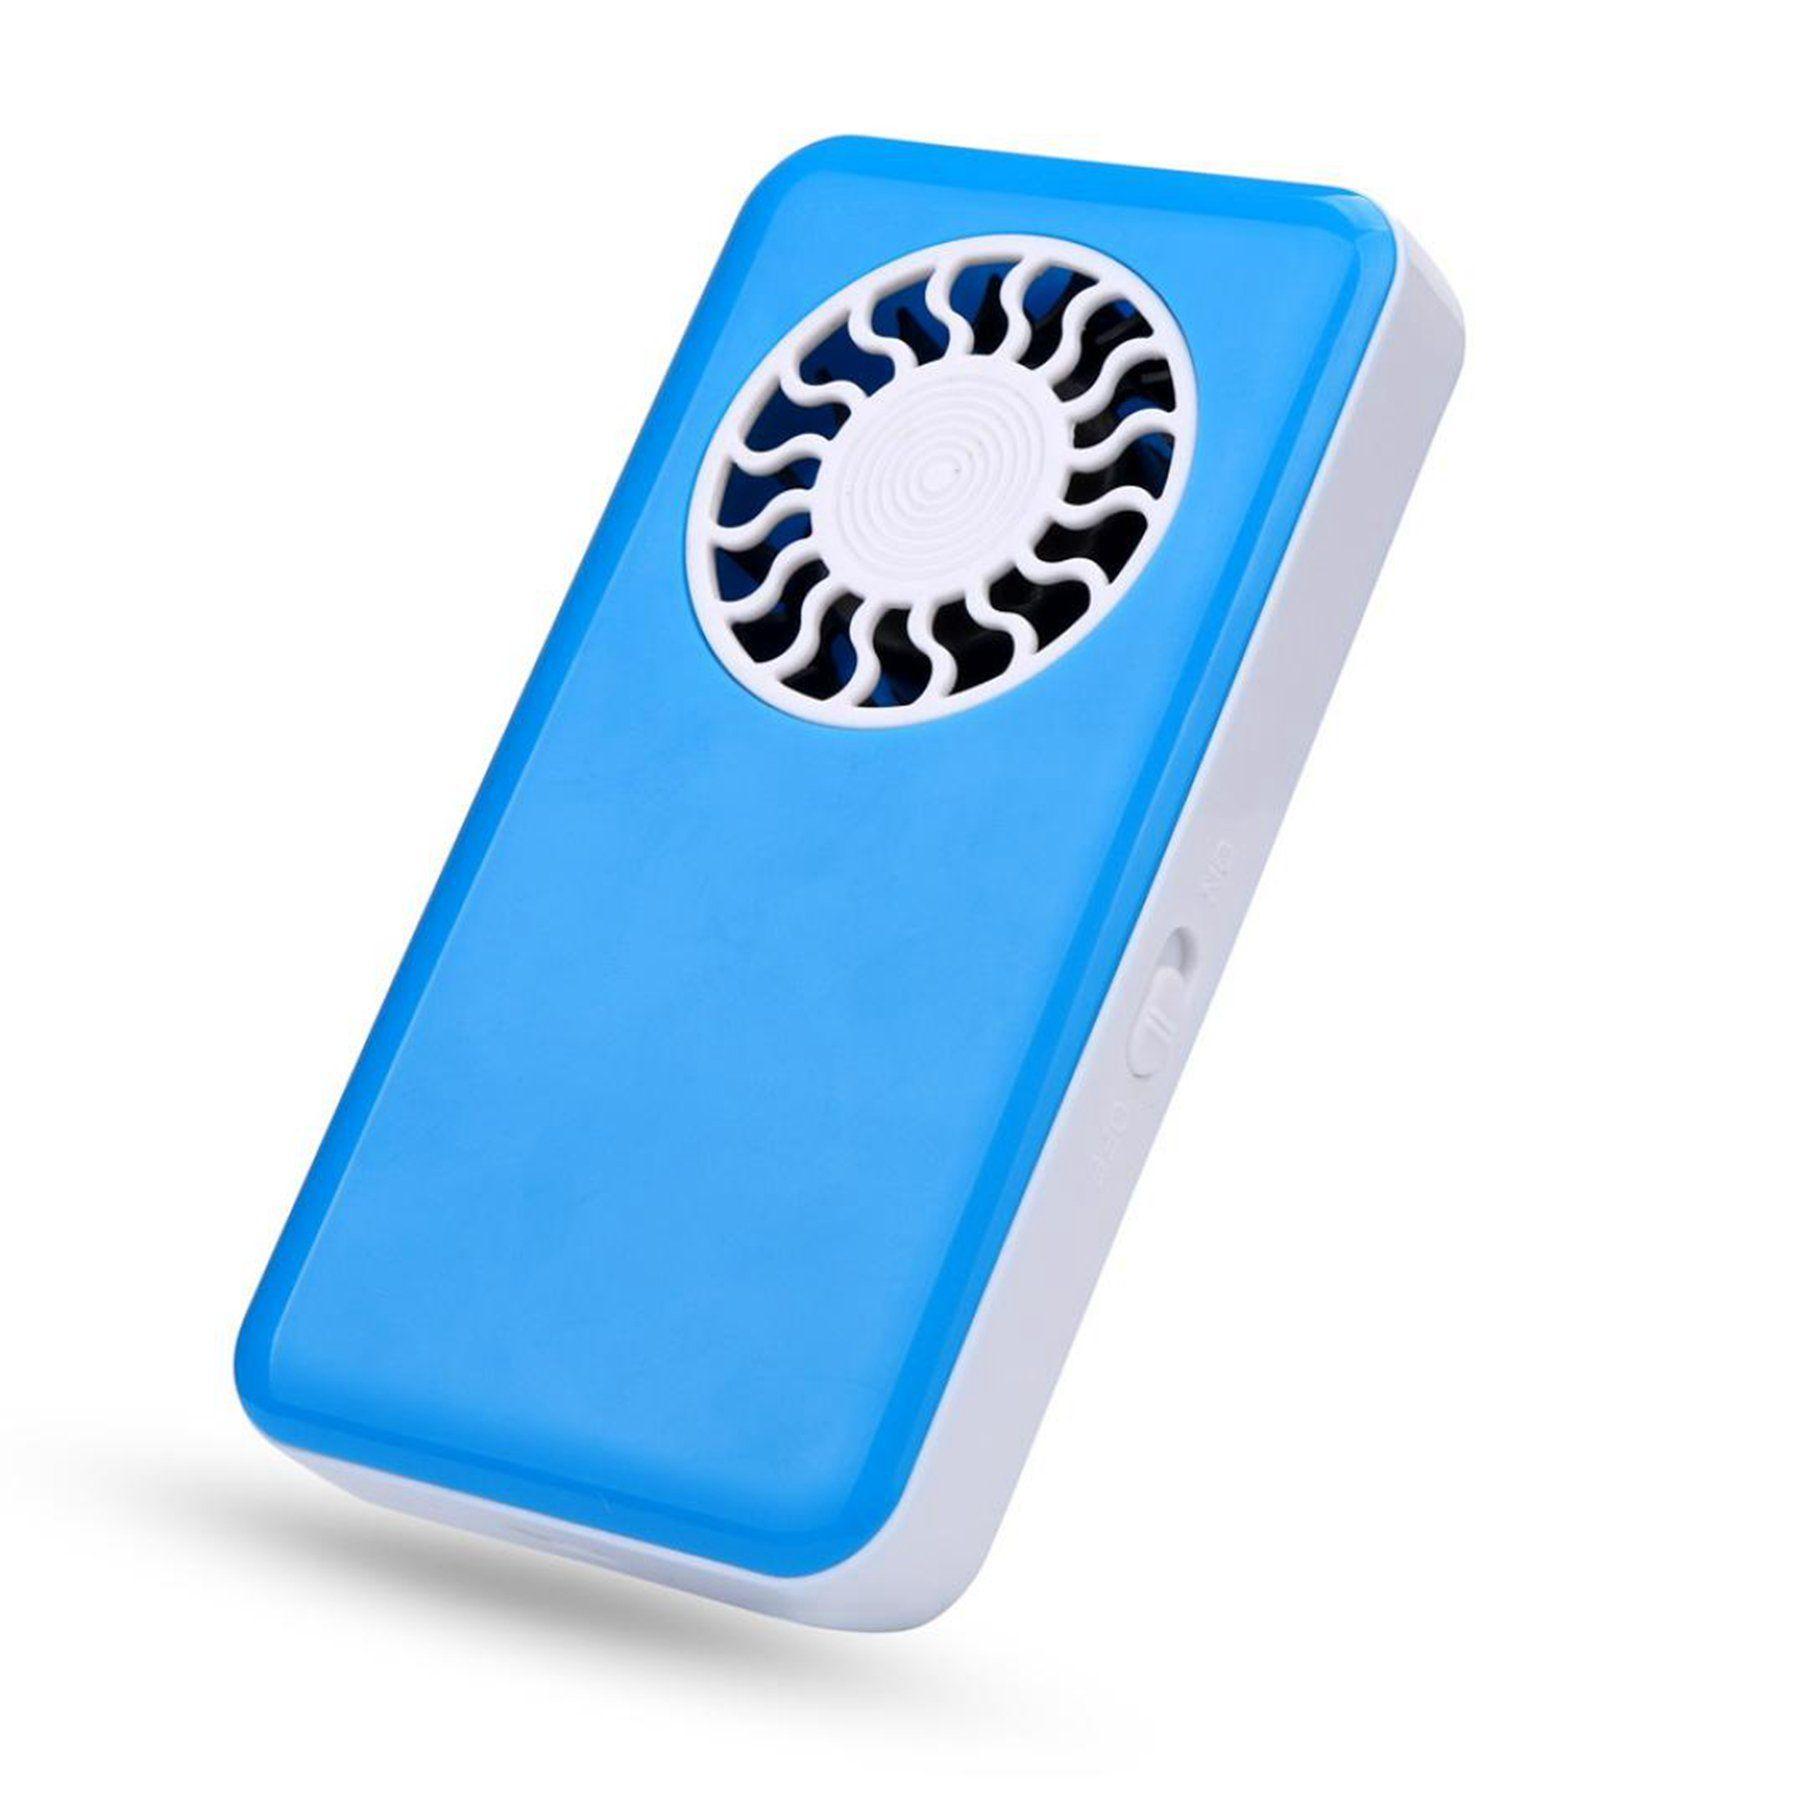 zeshlla mini portable usb handheld fan small air conditioner blue